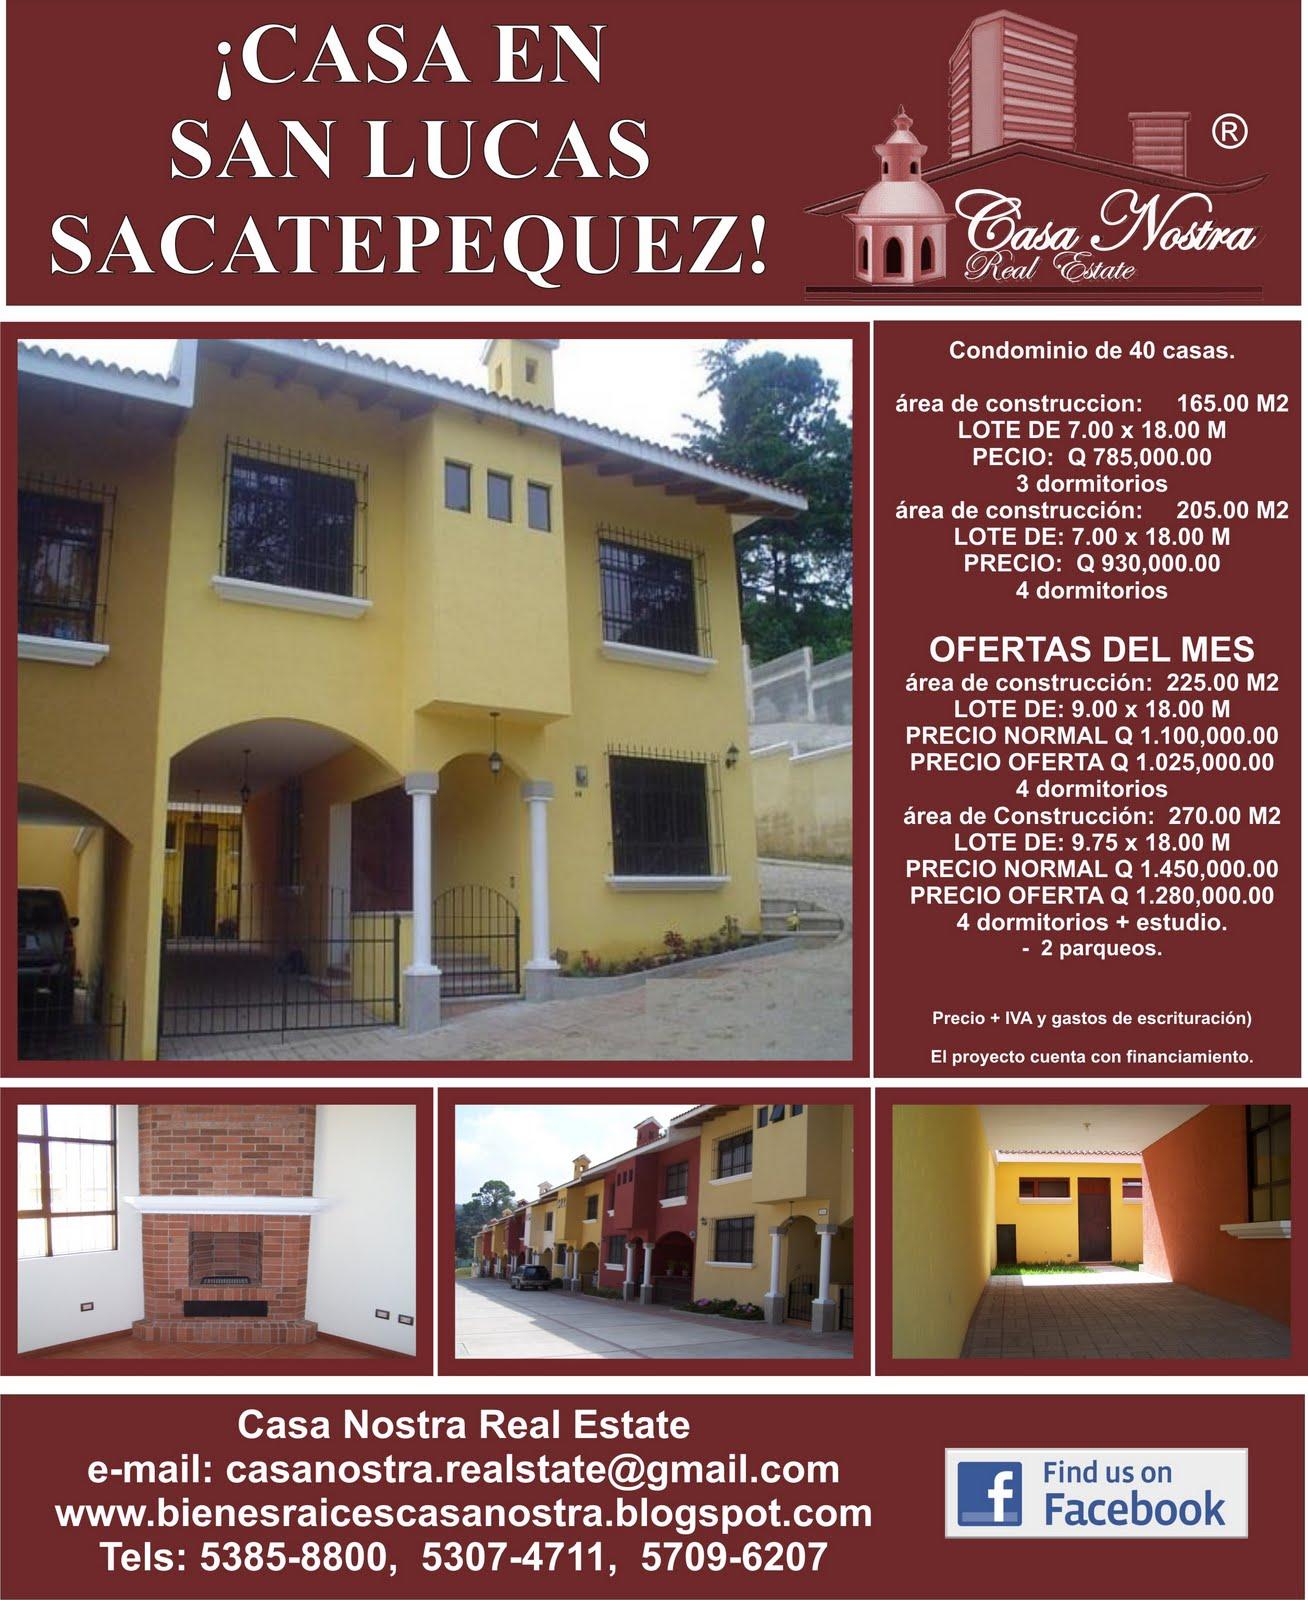 Disenos De Casas En Guatemala: Casa Nostra Real Estate: Casas En Venta En Proyecto En San